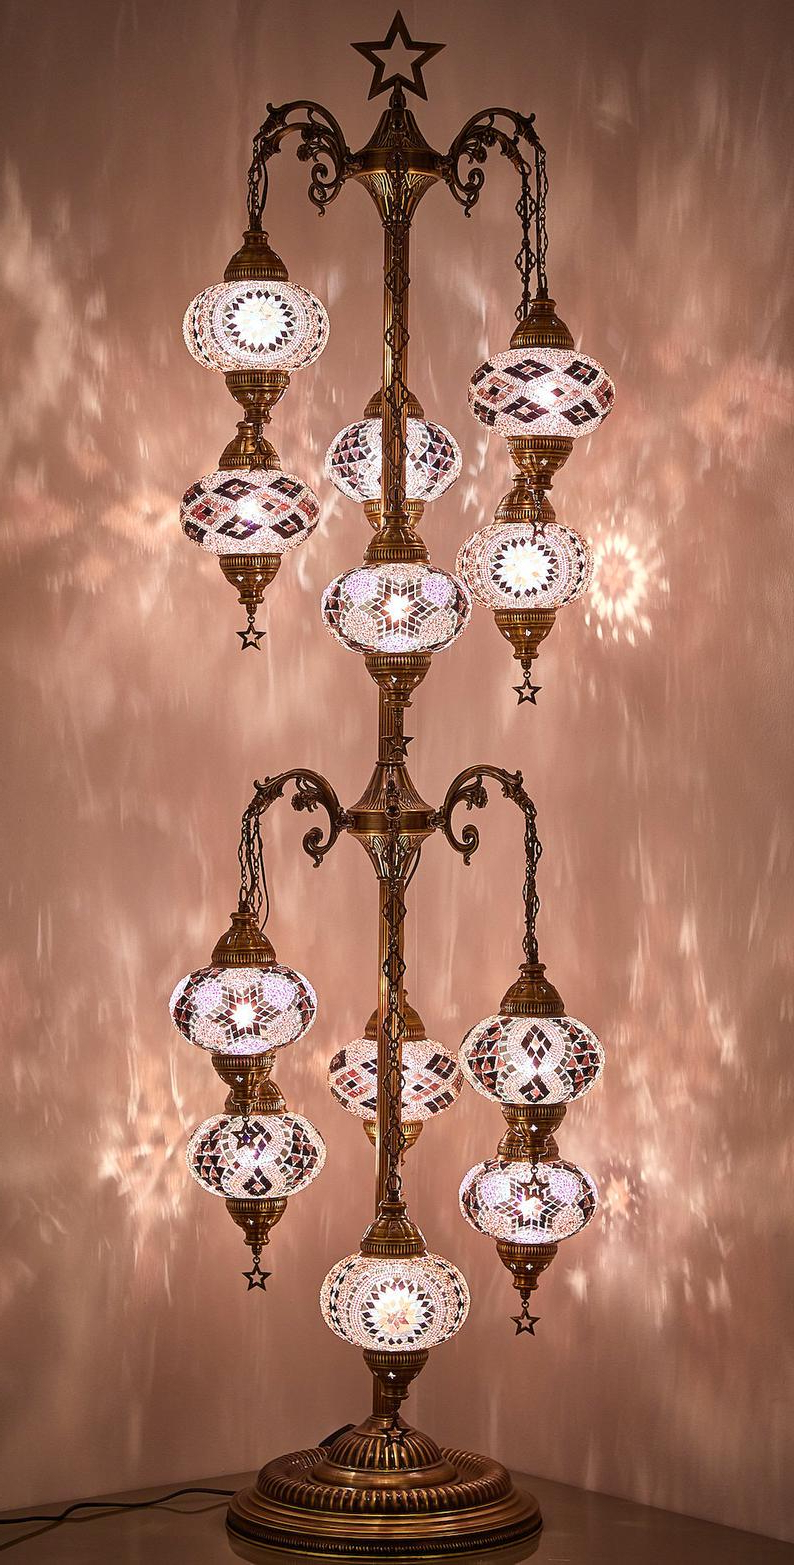 "Fashionable Demmex 12 Big Globes Mosaic Turkish Moroccan Christmas Tree Bohemian  Tiffany Floor Lamp Light, Us Plug & Socket, 68"" Pertaining To Donna 4 Light Globe Chandeliers (View 24 of 25)"